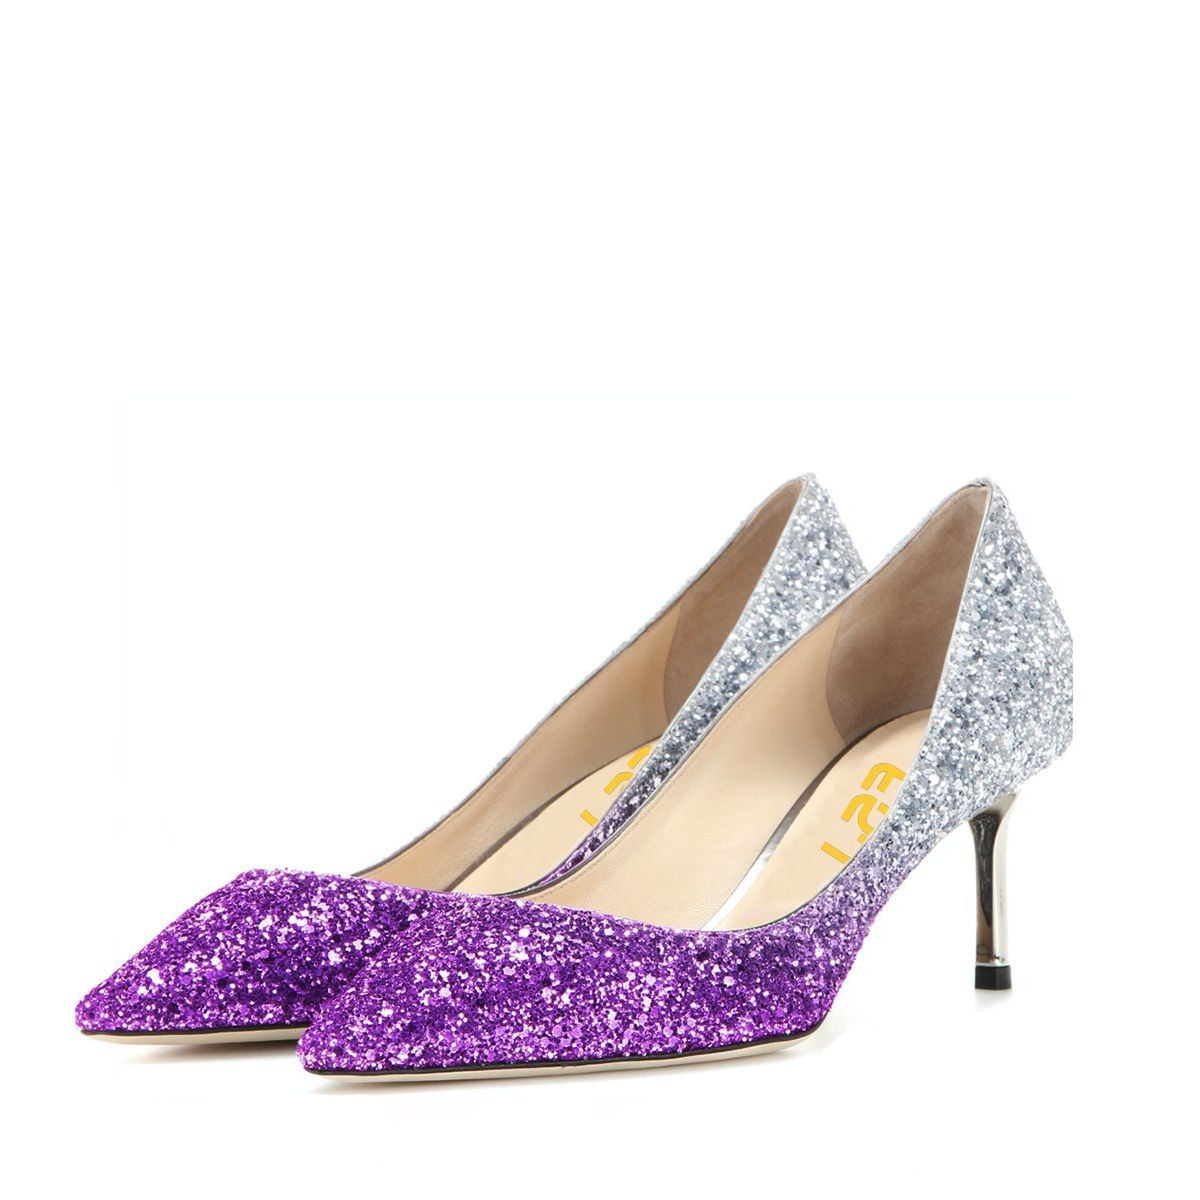 Women's Purple and Silver Gradient Color Bridal Heels